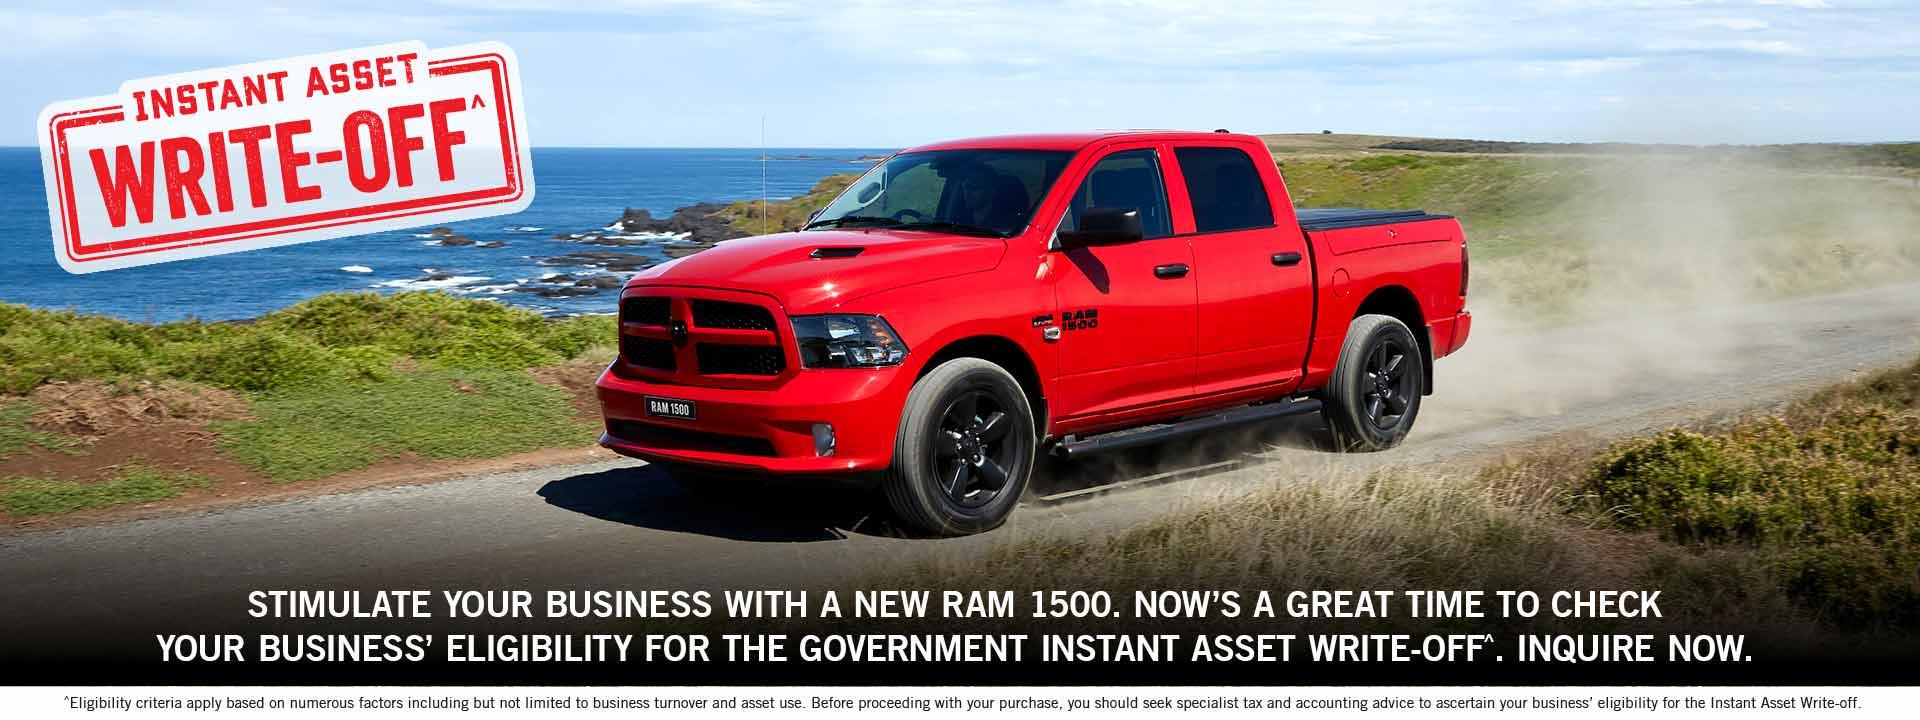 RAM 1500 Express Crew Cab | V8 Hemi | 4x4 Pickup Truck | Instant Asset Write Off | Ram Trucks Australia